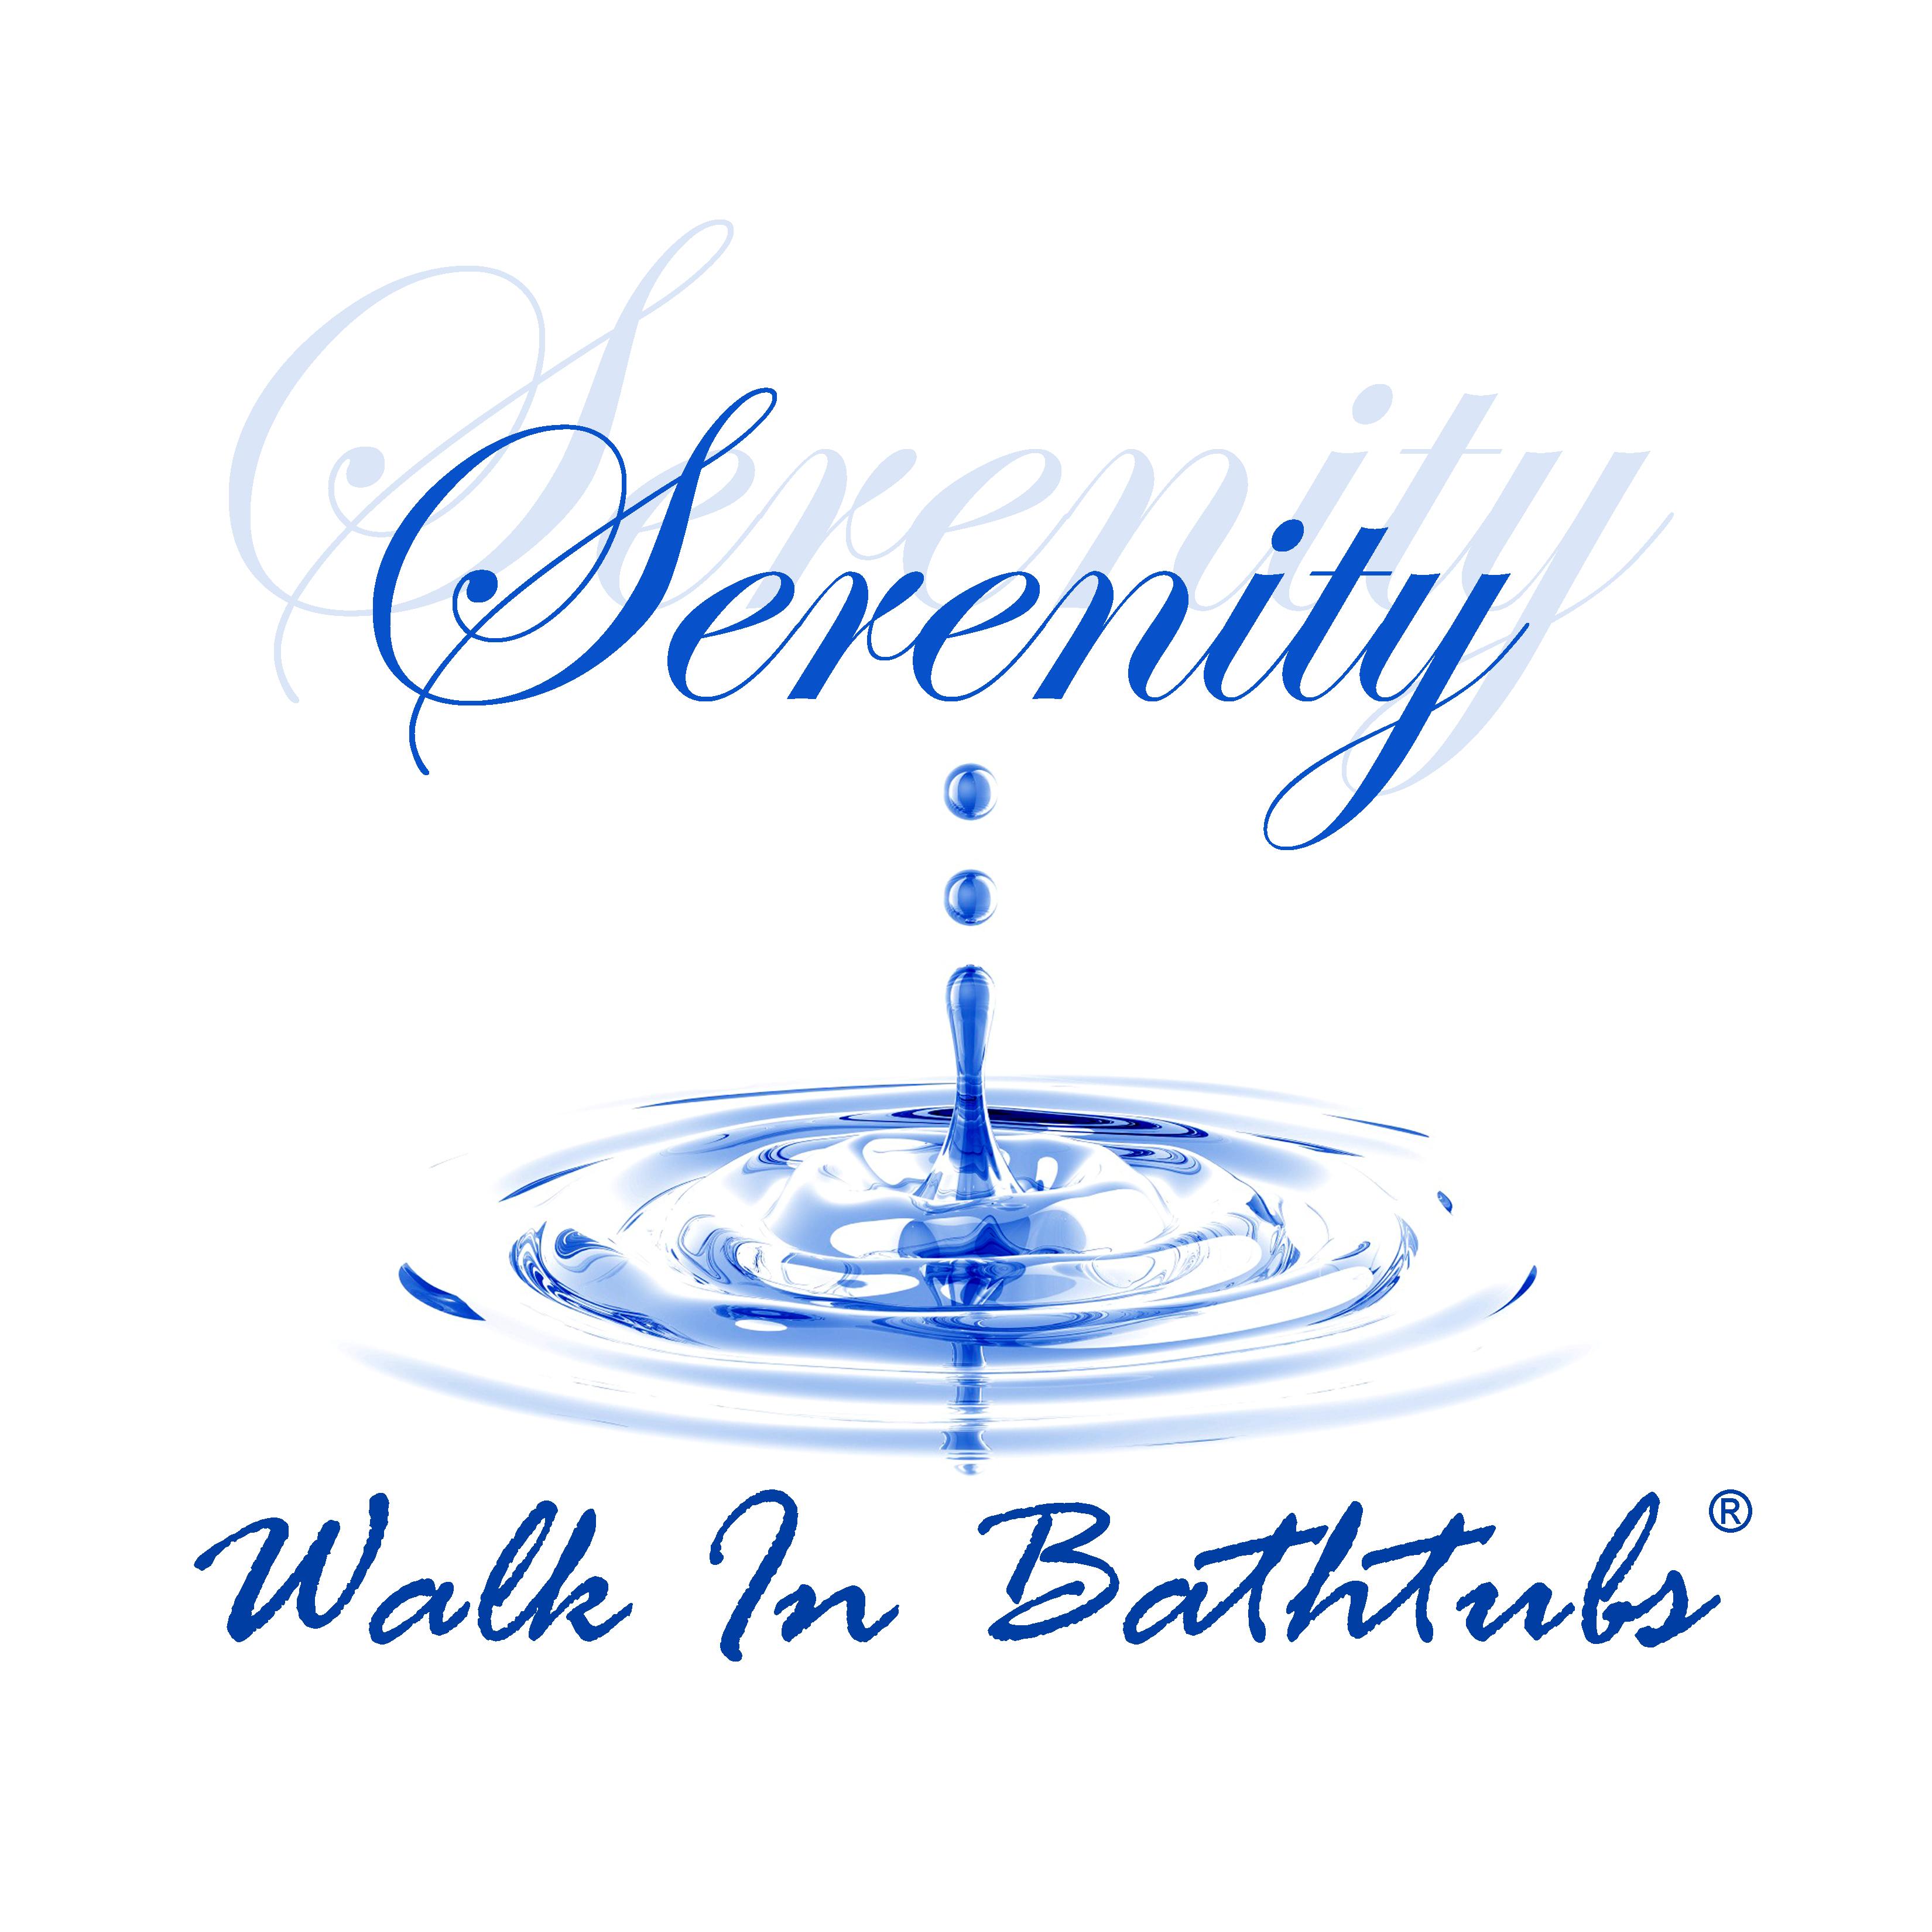 Serenity Walk in Bathtubs